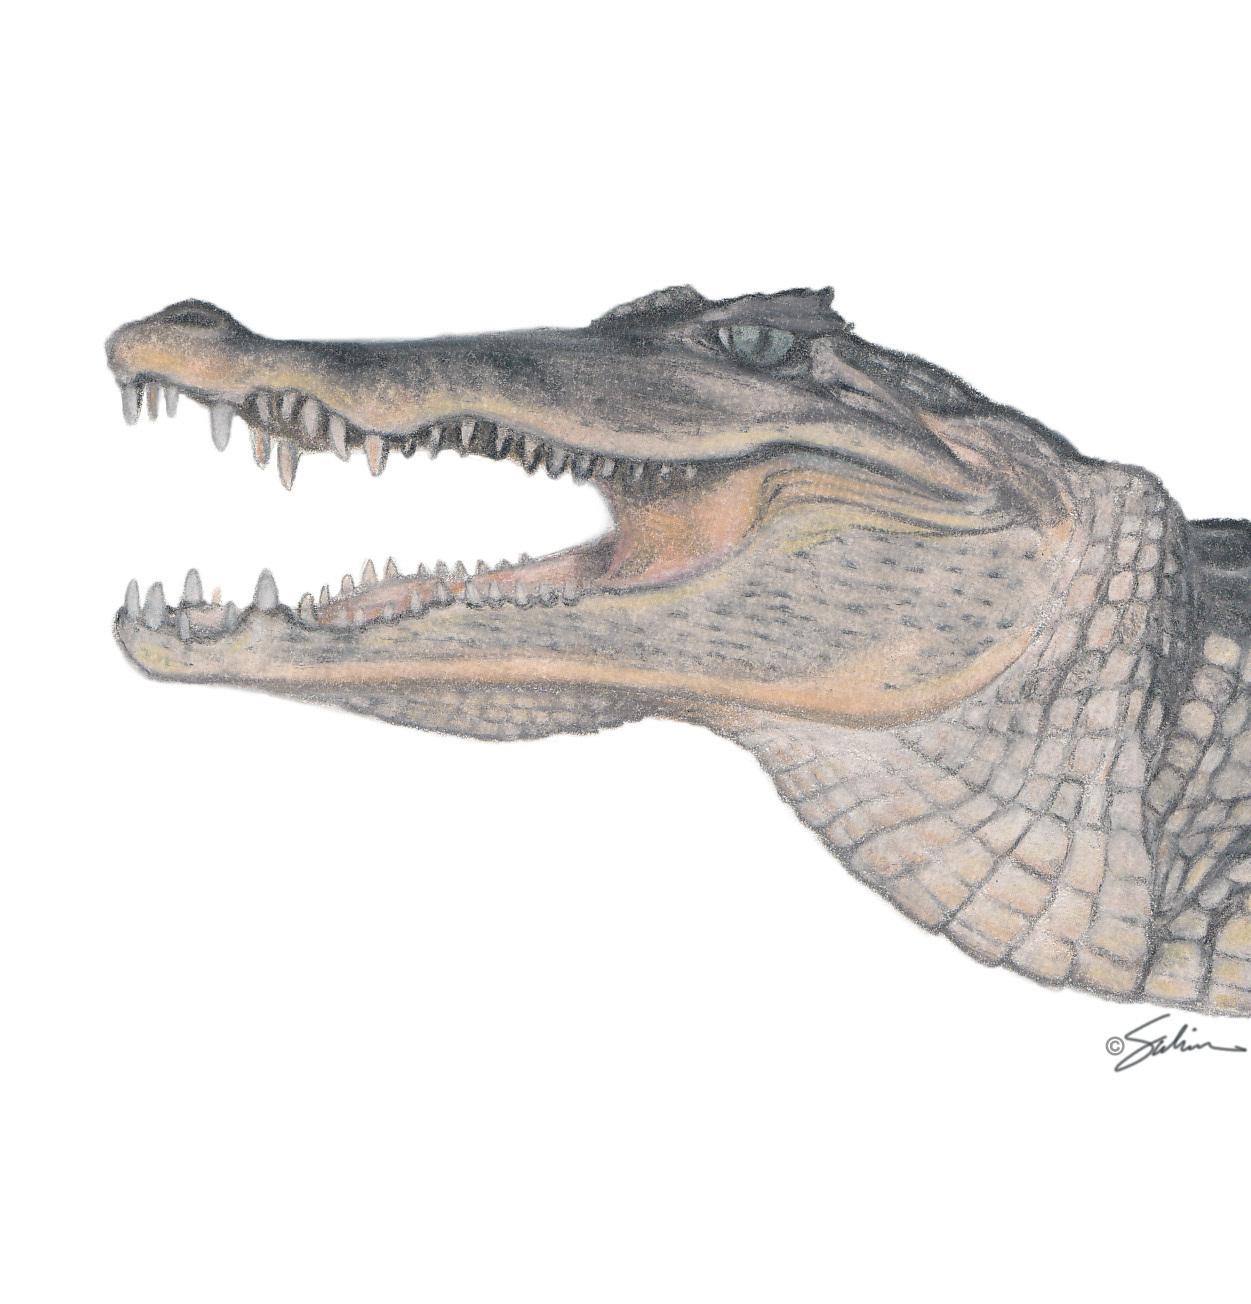 Nile Crocodile Tooth Bone Clones Inc Osteological Reproductions